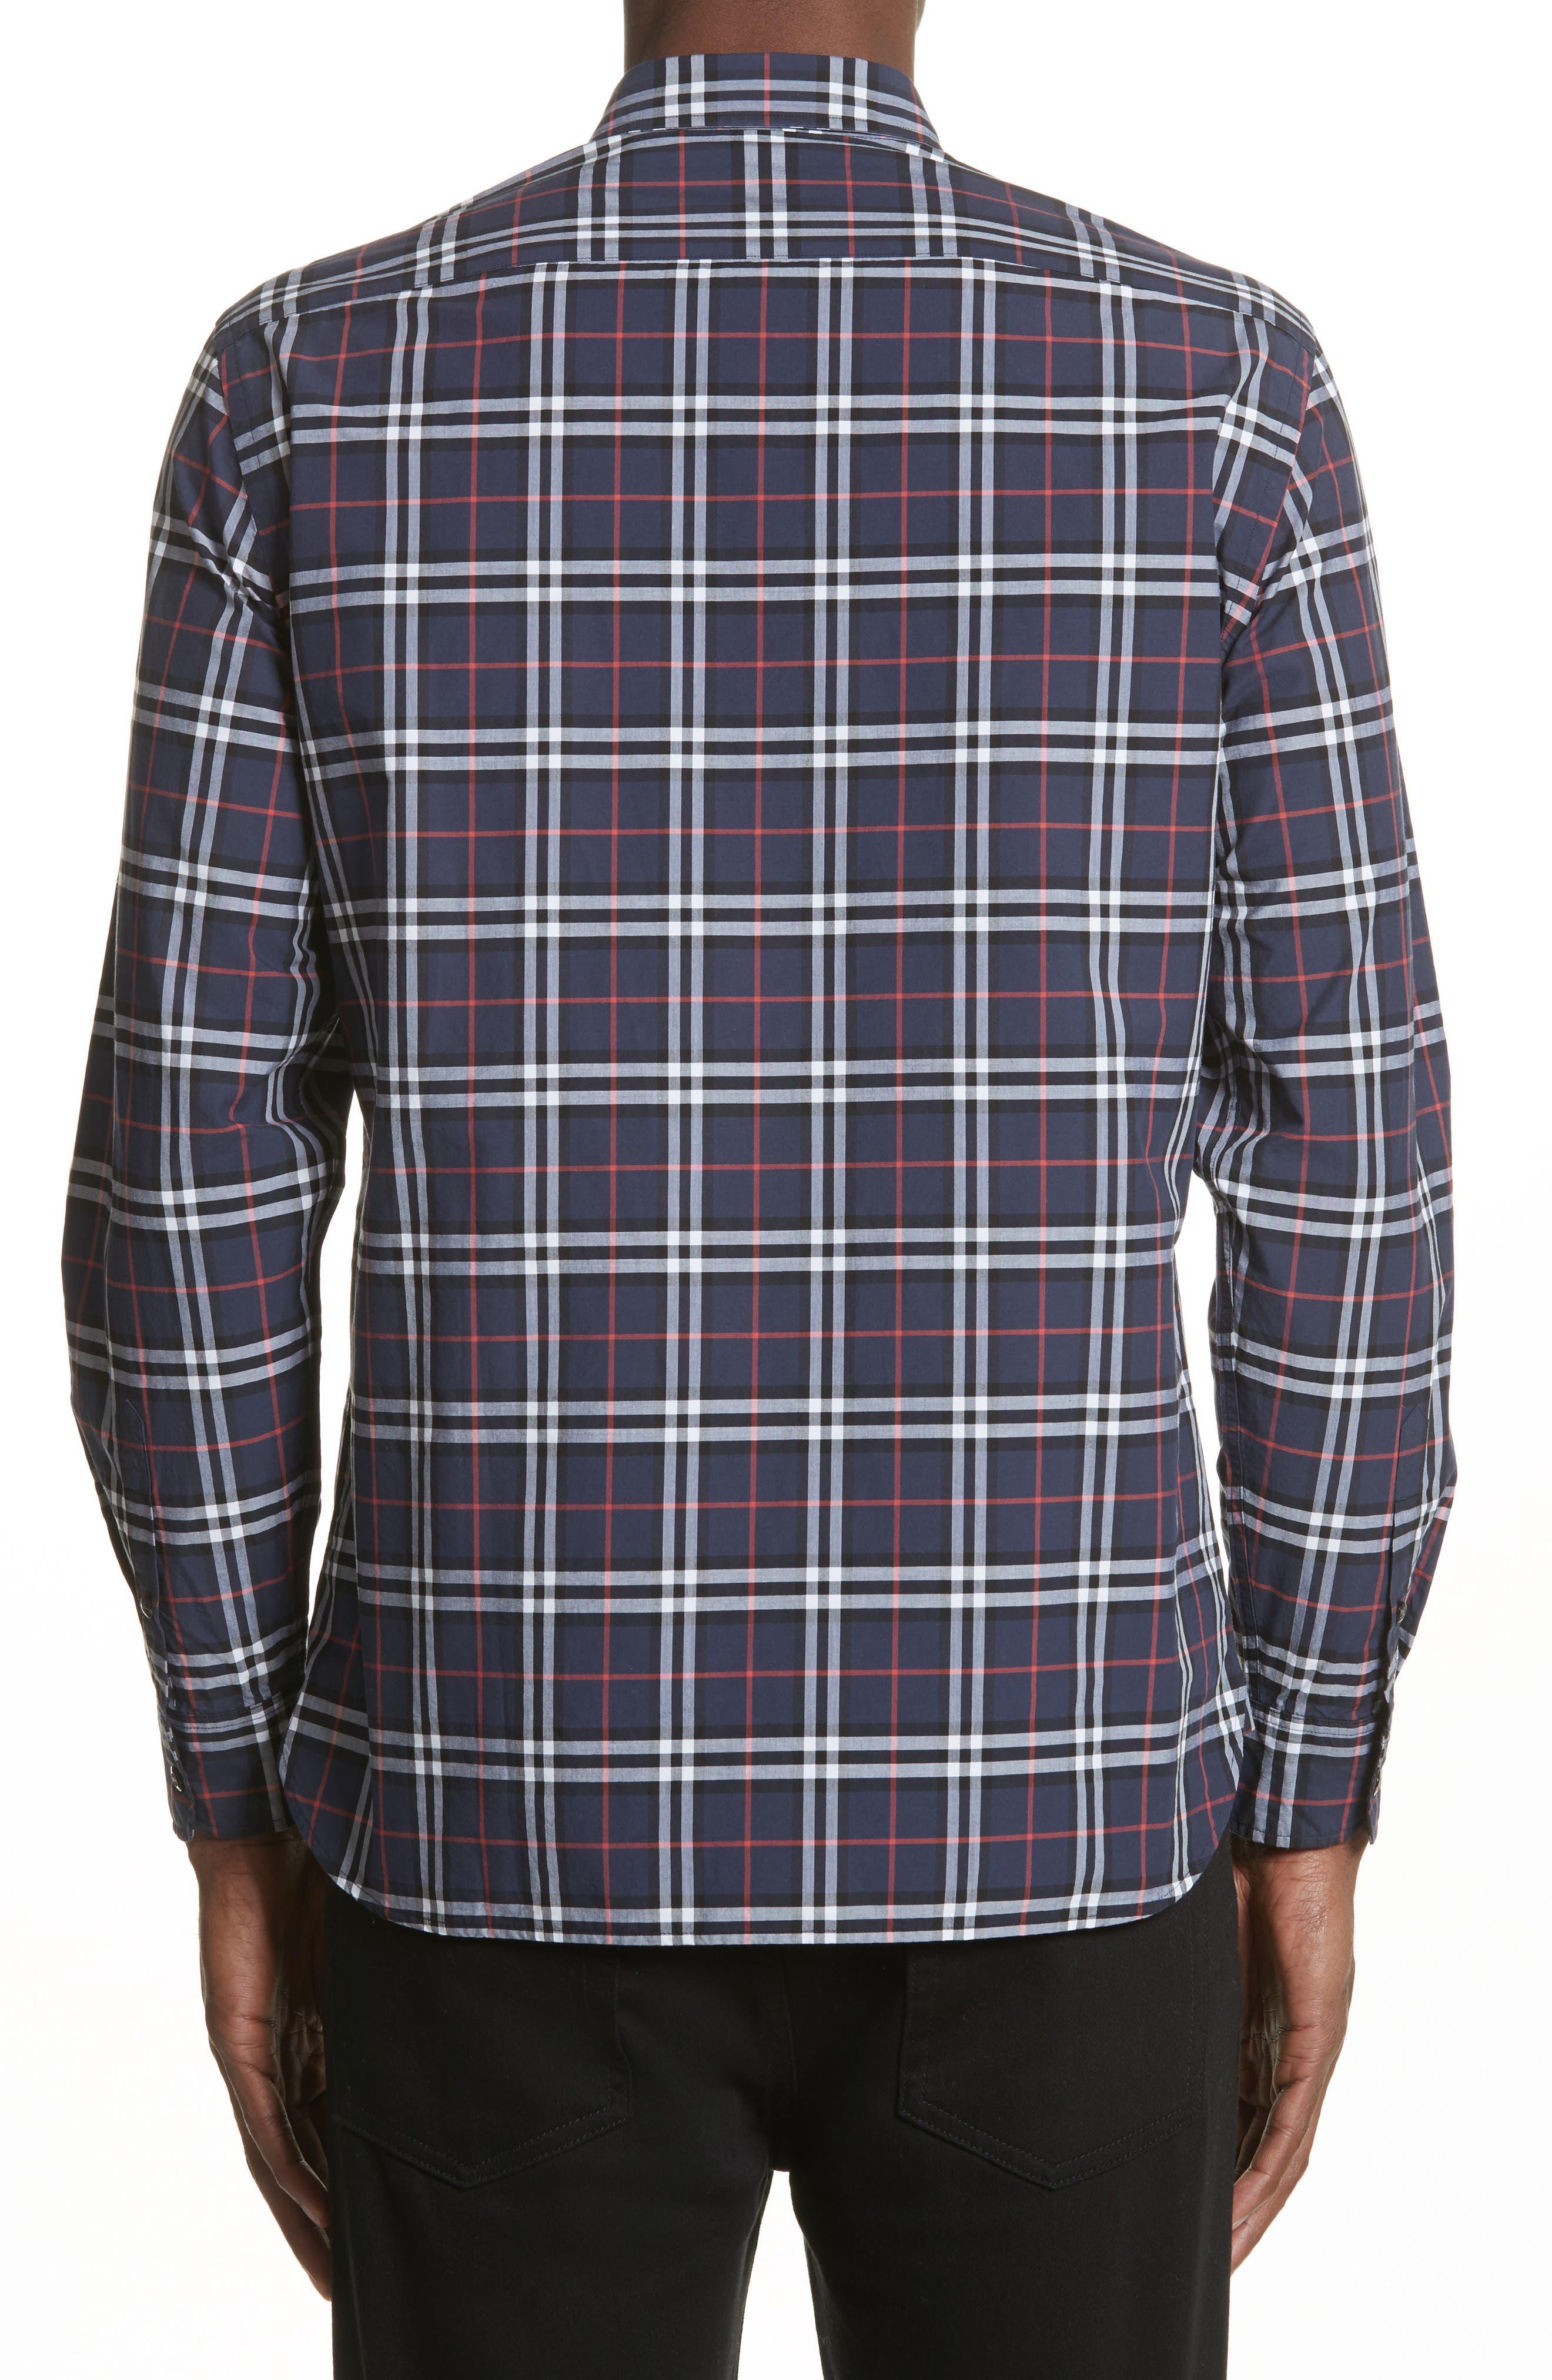 Alexander Check Sport Shirt,                             Alternate thumbnail 2, color,                             NAVY